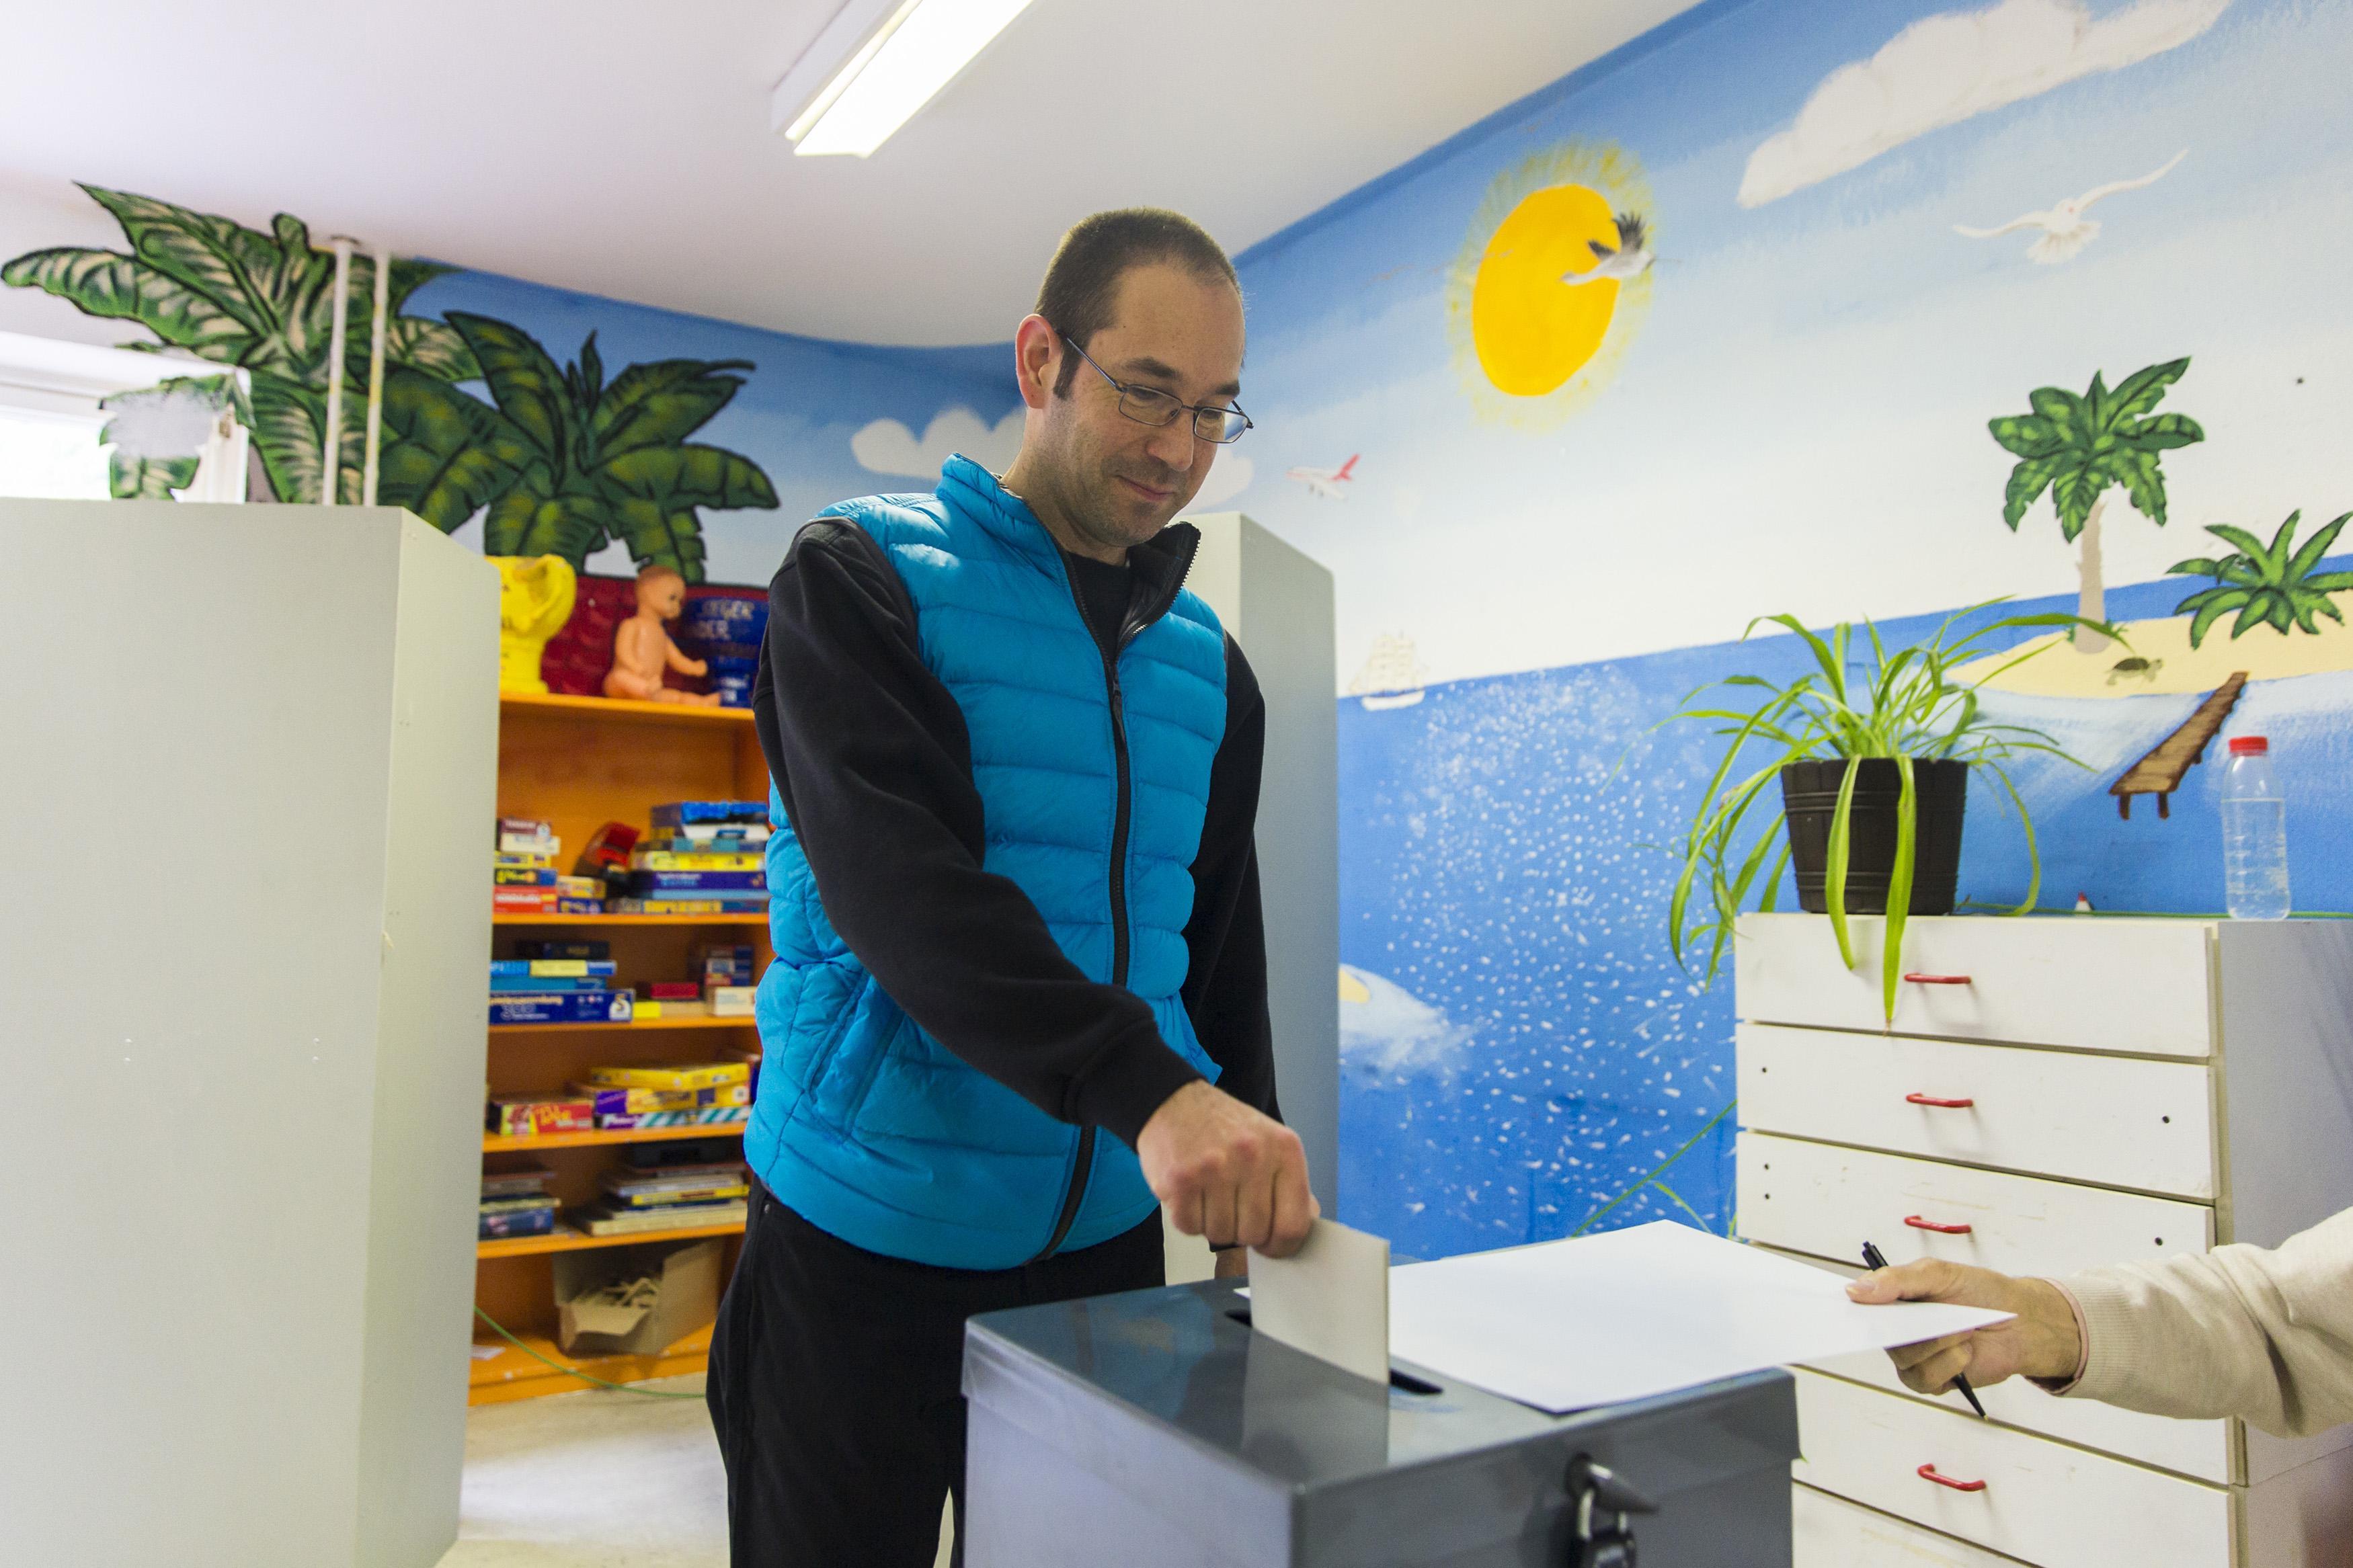 Merkel eyes third term in tight German election